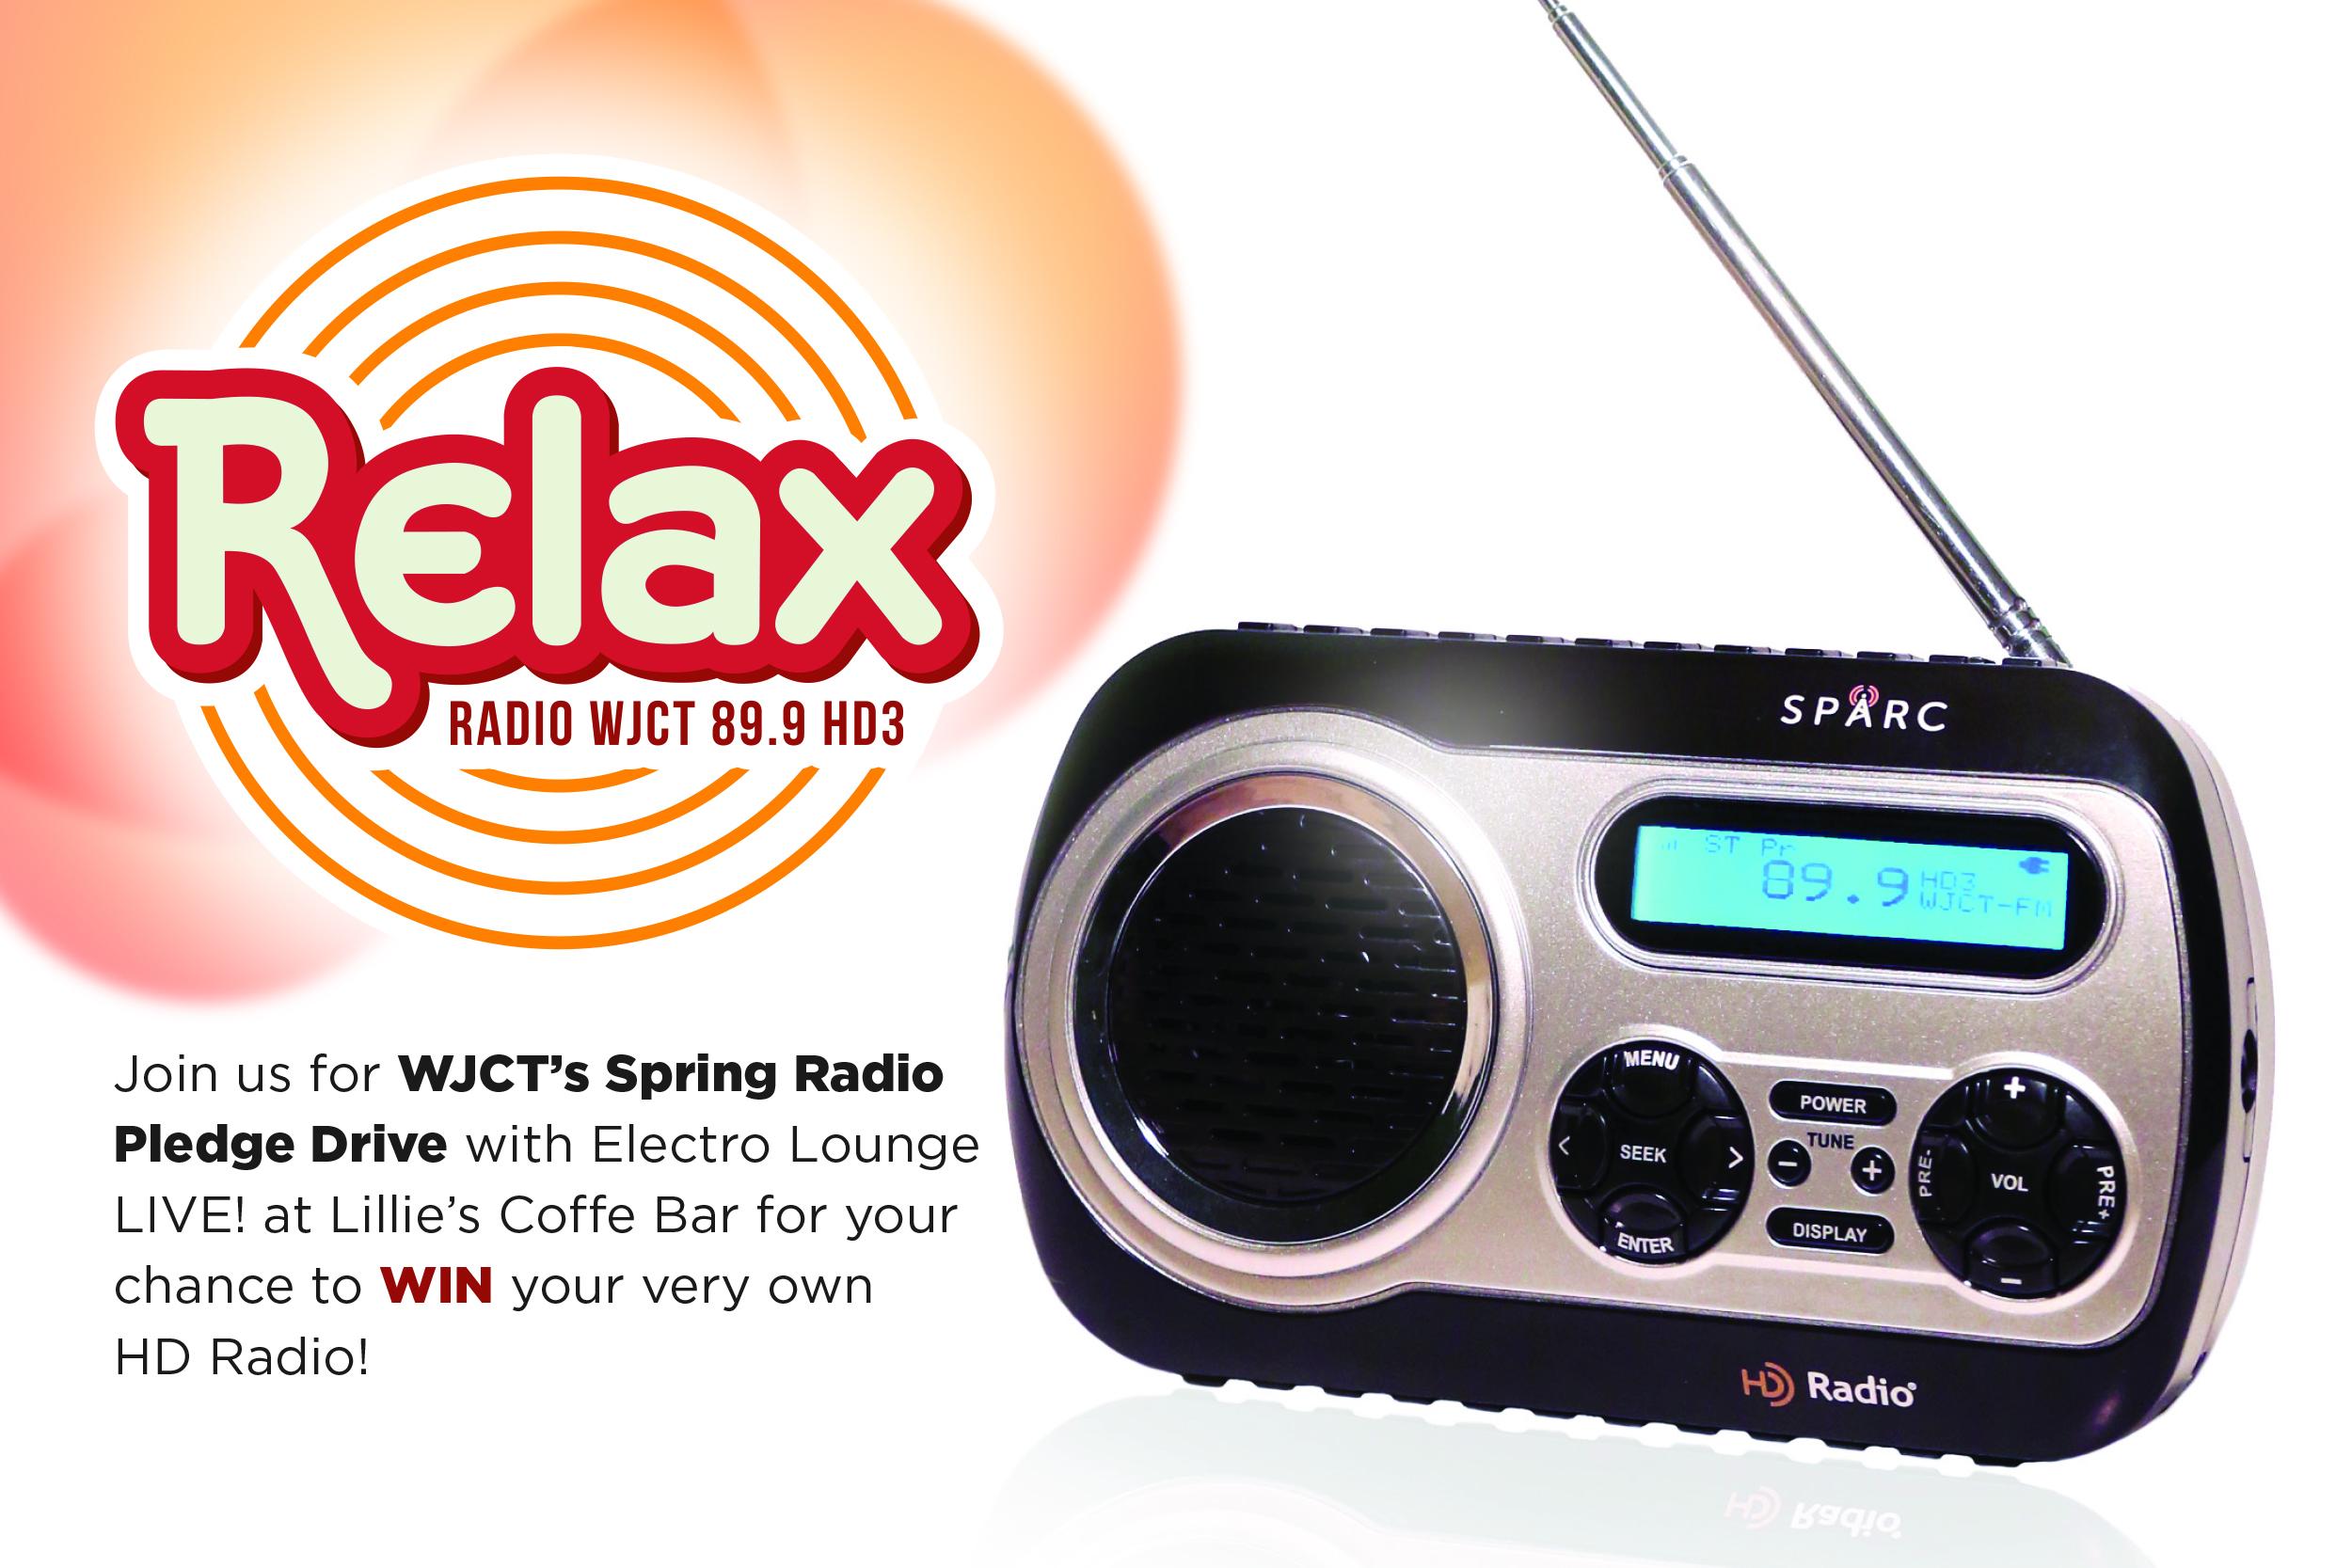 relax_radio_win_01_600x400